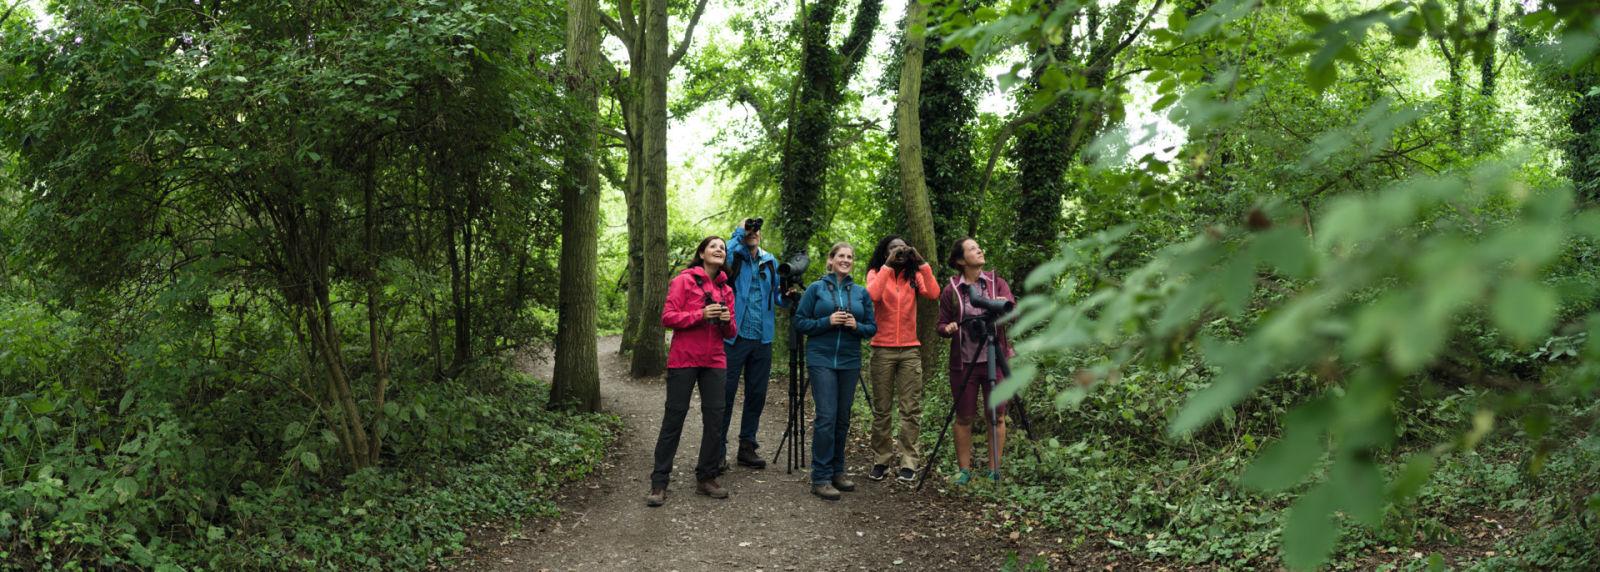 Why everyone can become a great birder - SWAROVSKI OPTIK Tripods BTX, ATX, EL, CL, Birders, Titchwell